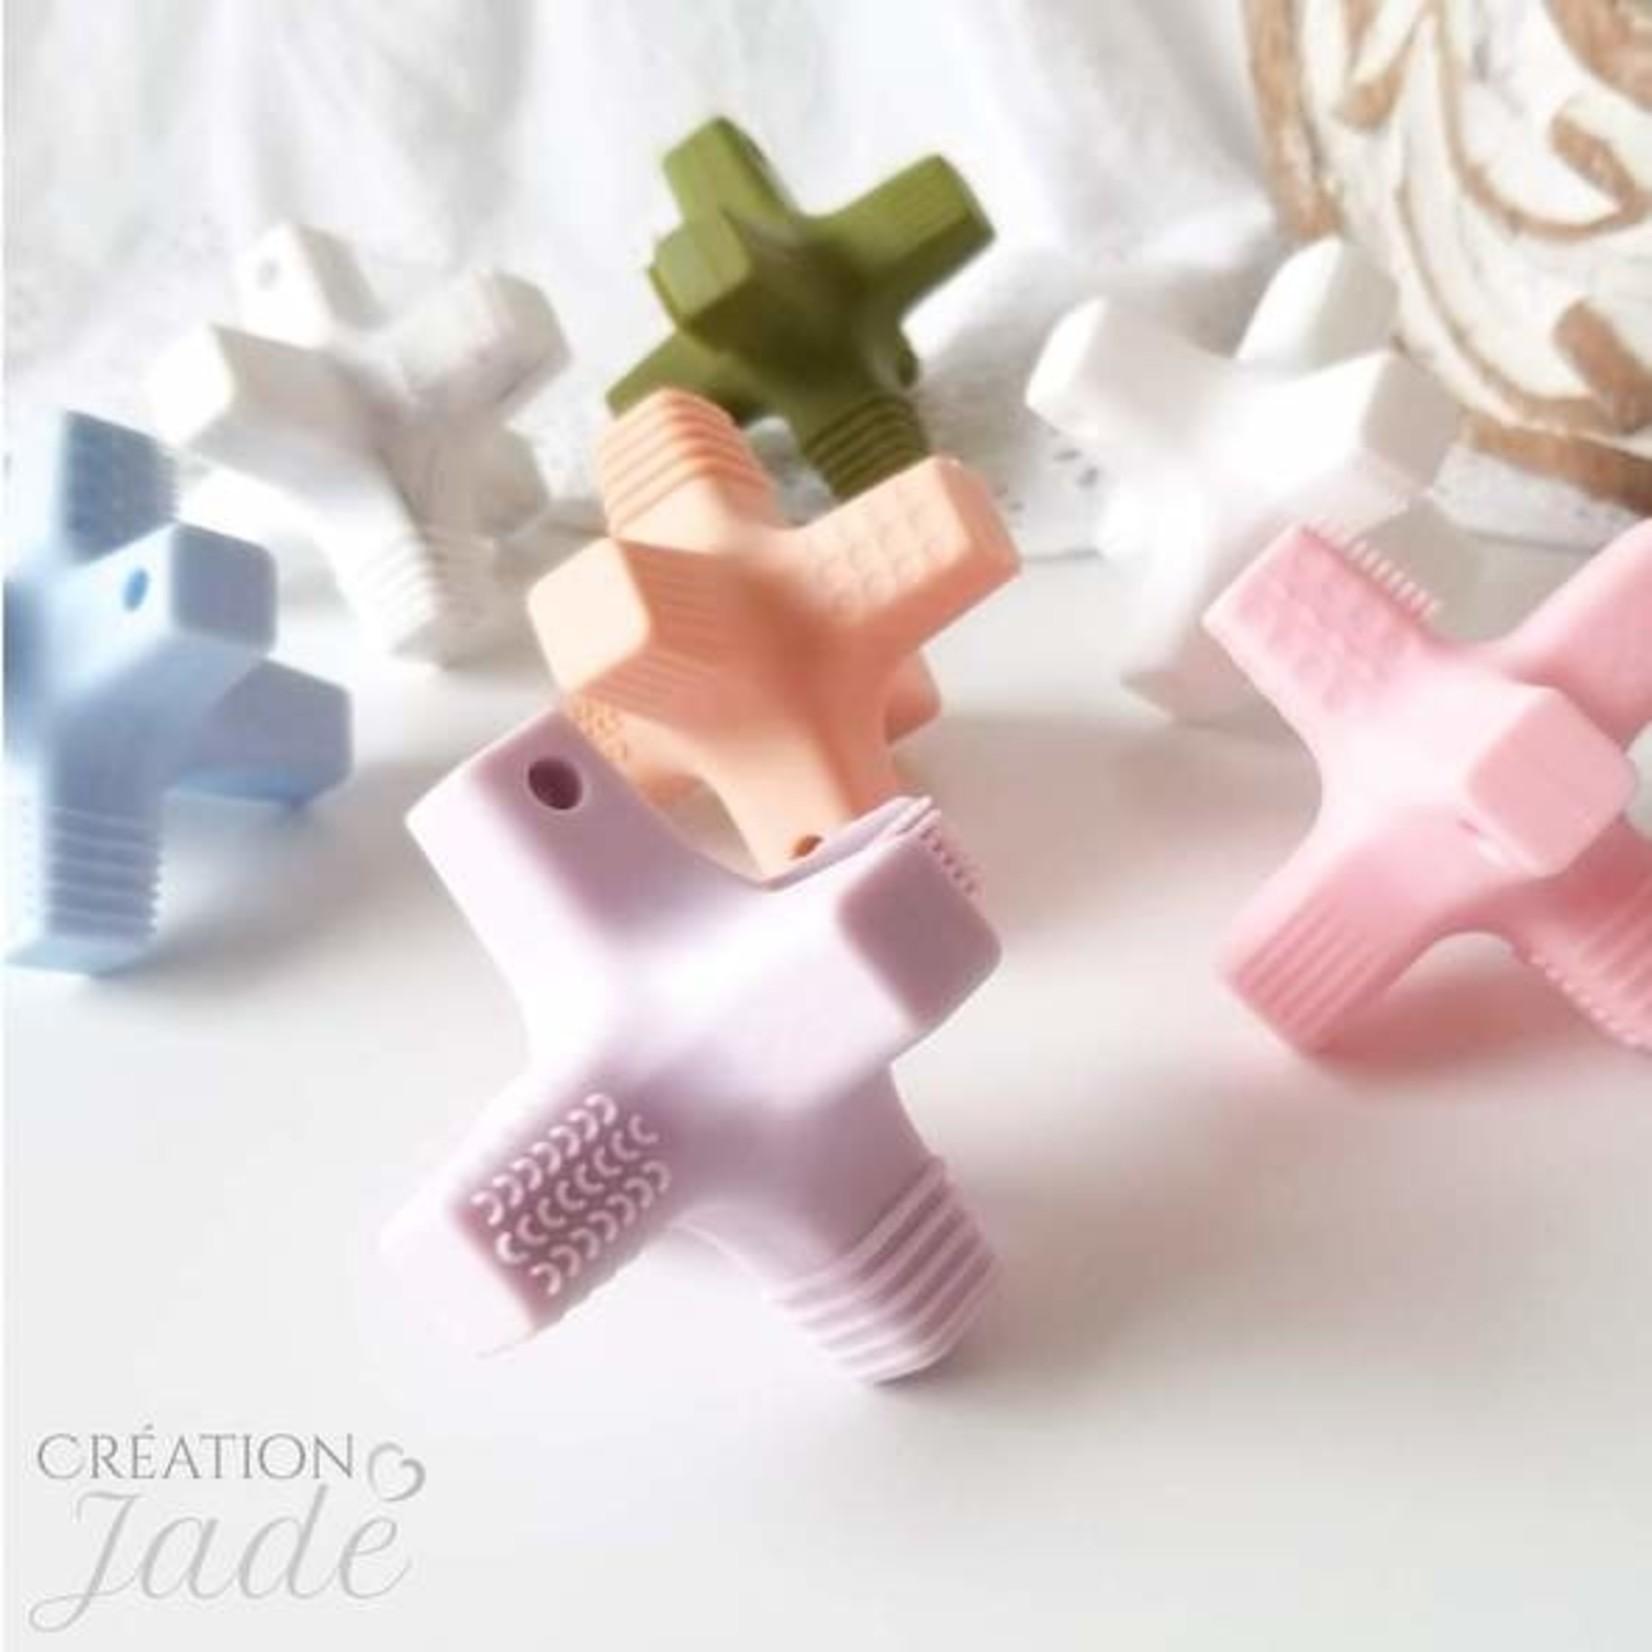 Création Jade || Croix sensorielle Olive